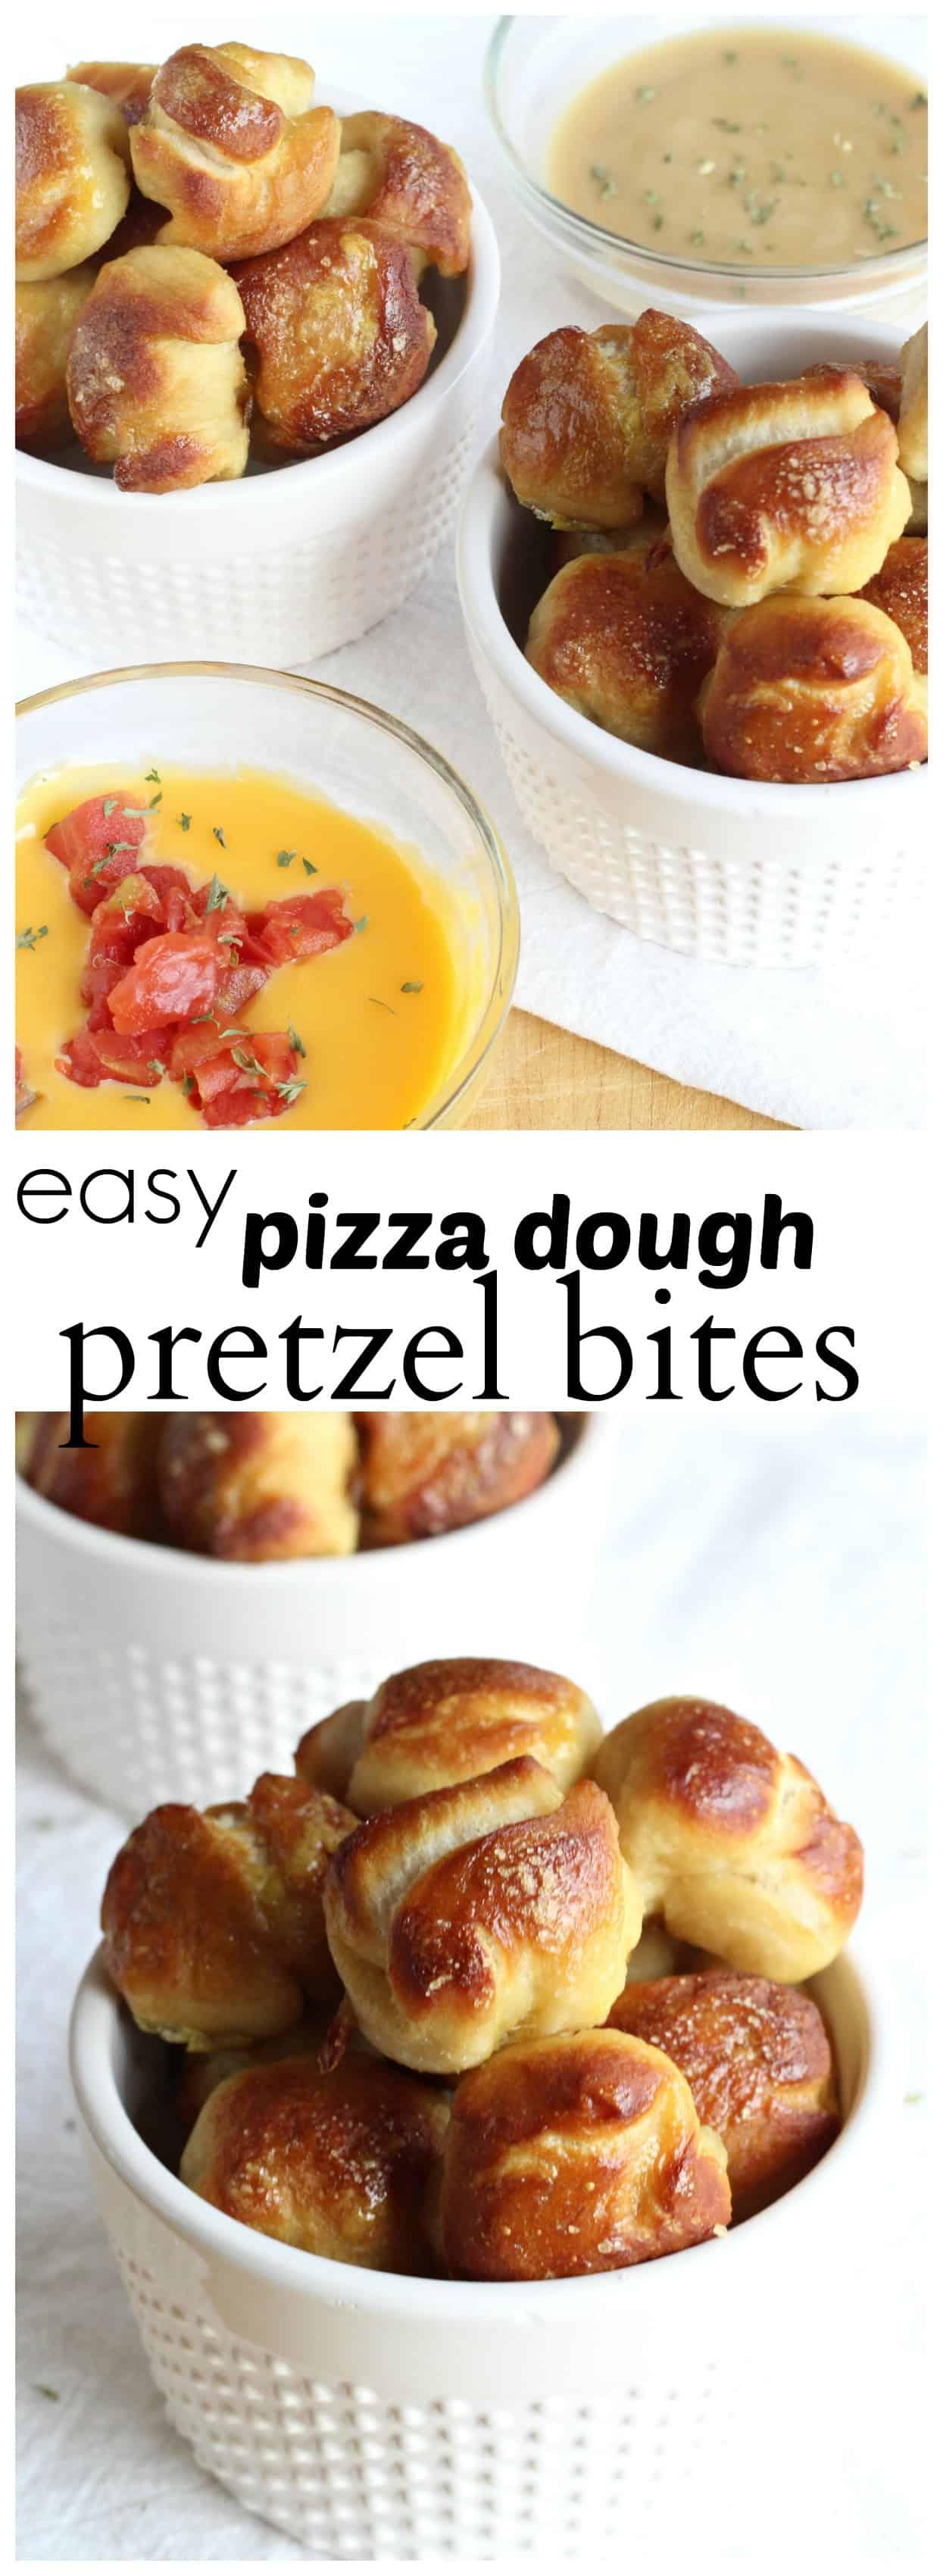 Pizza Dough Pretzel Bites Delicious Made Easy